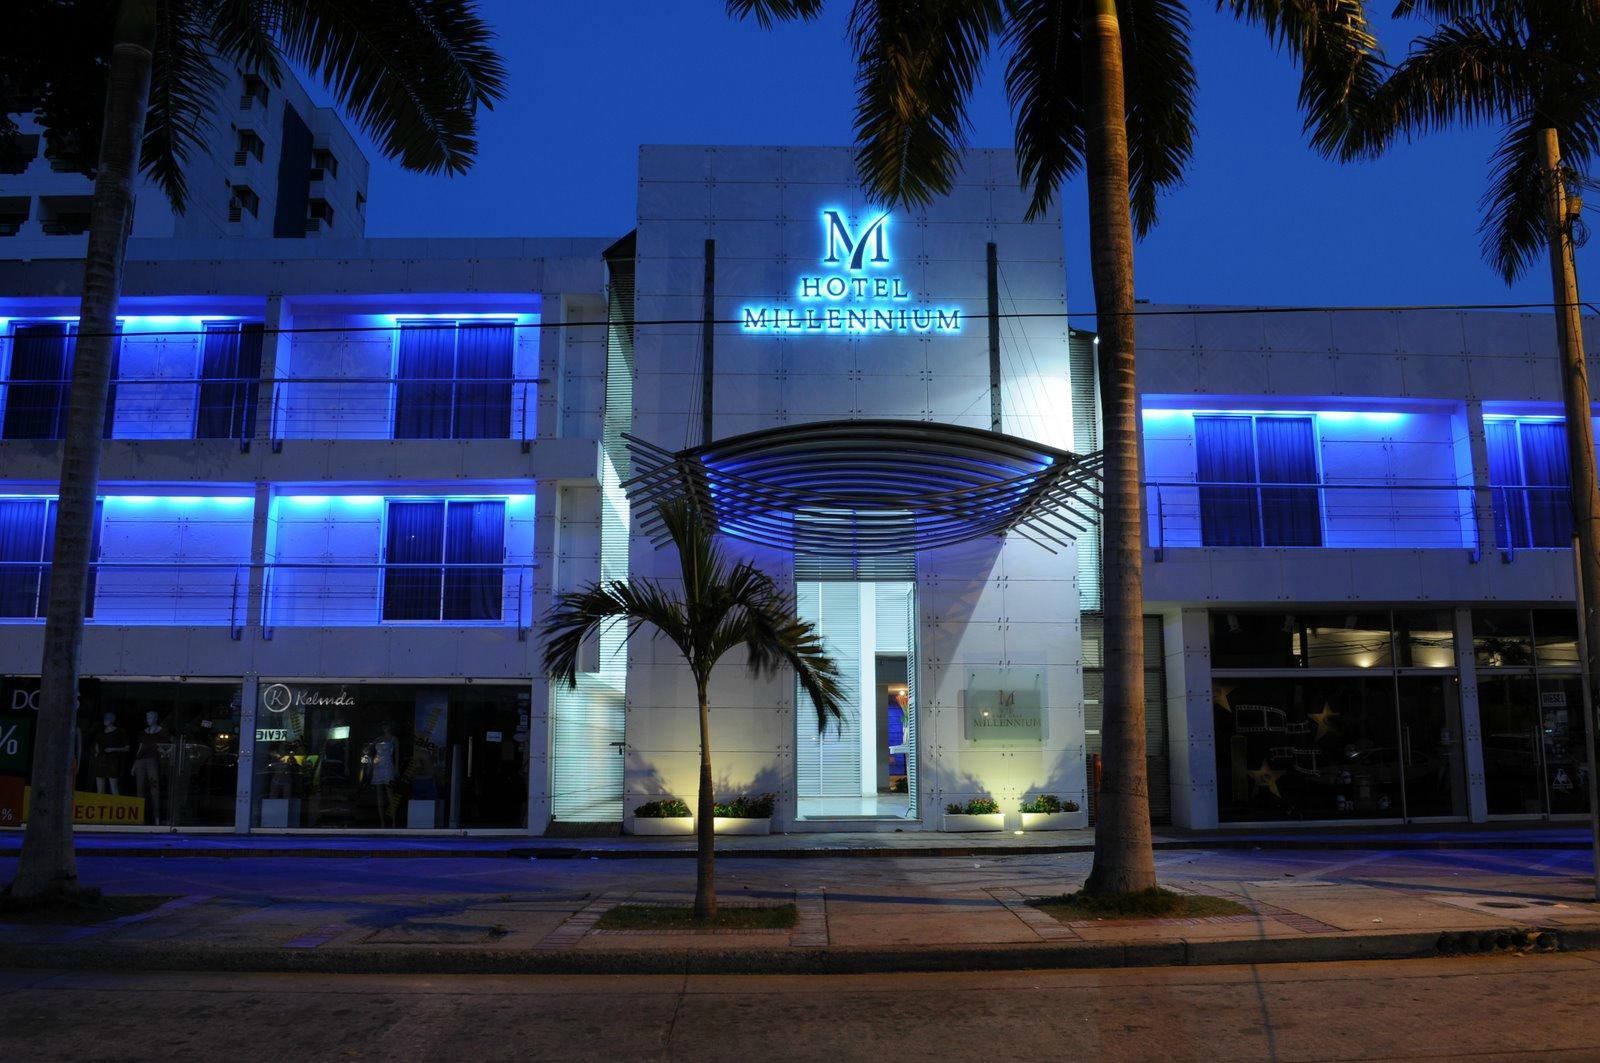 Cartagena Millennium